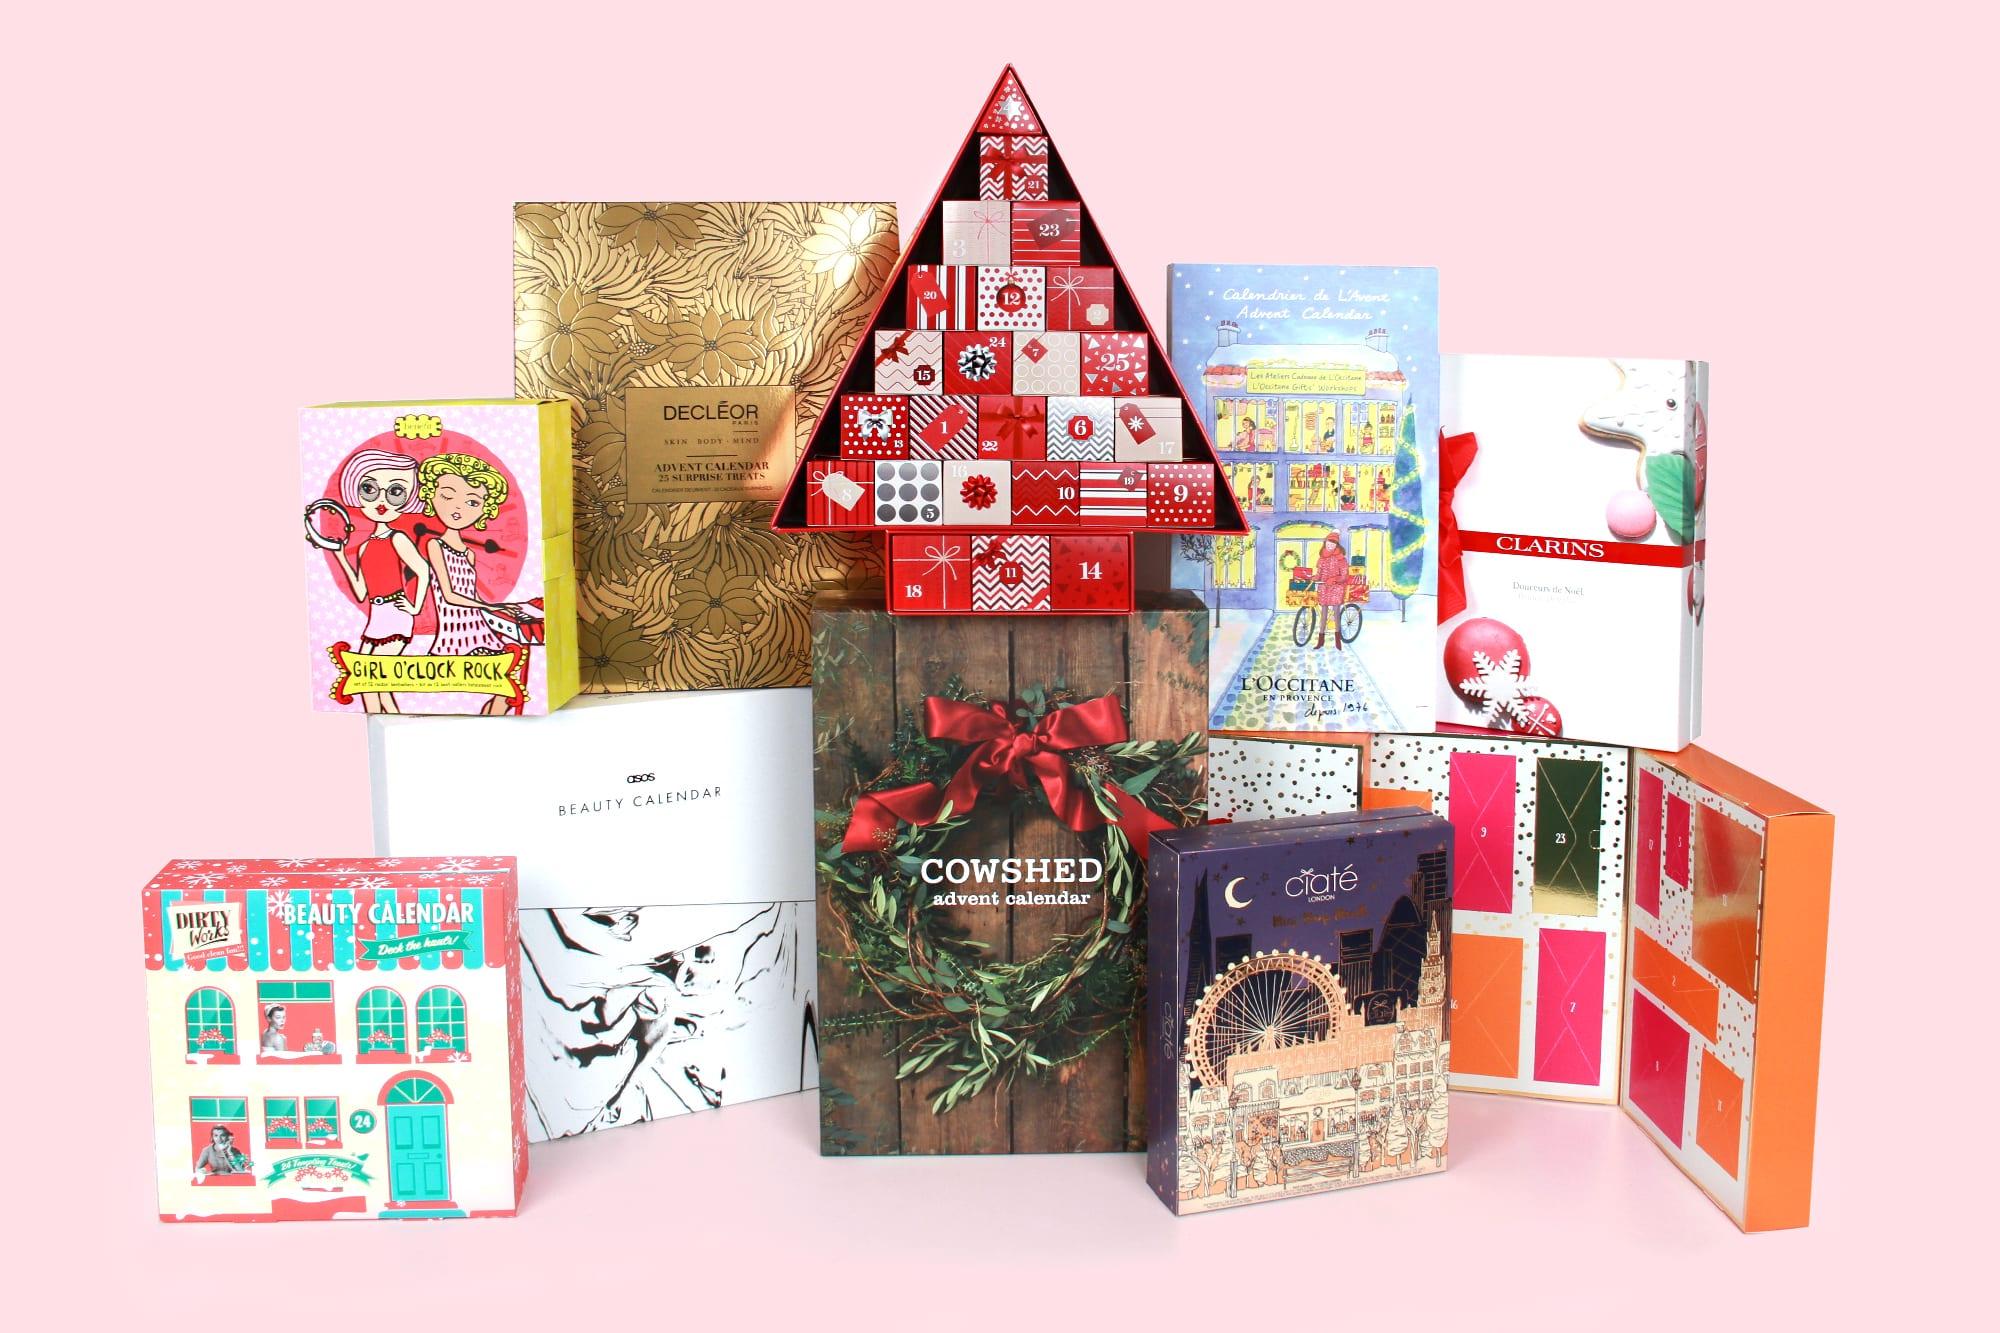 The Best Beauty Advent Calendars